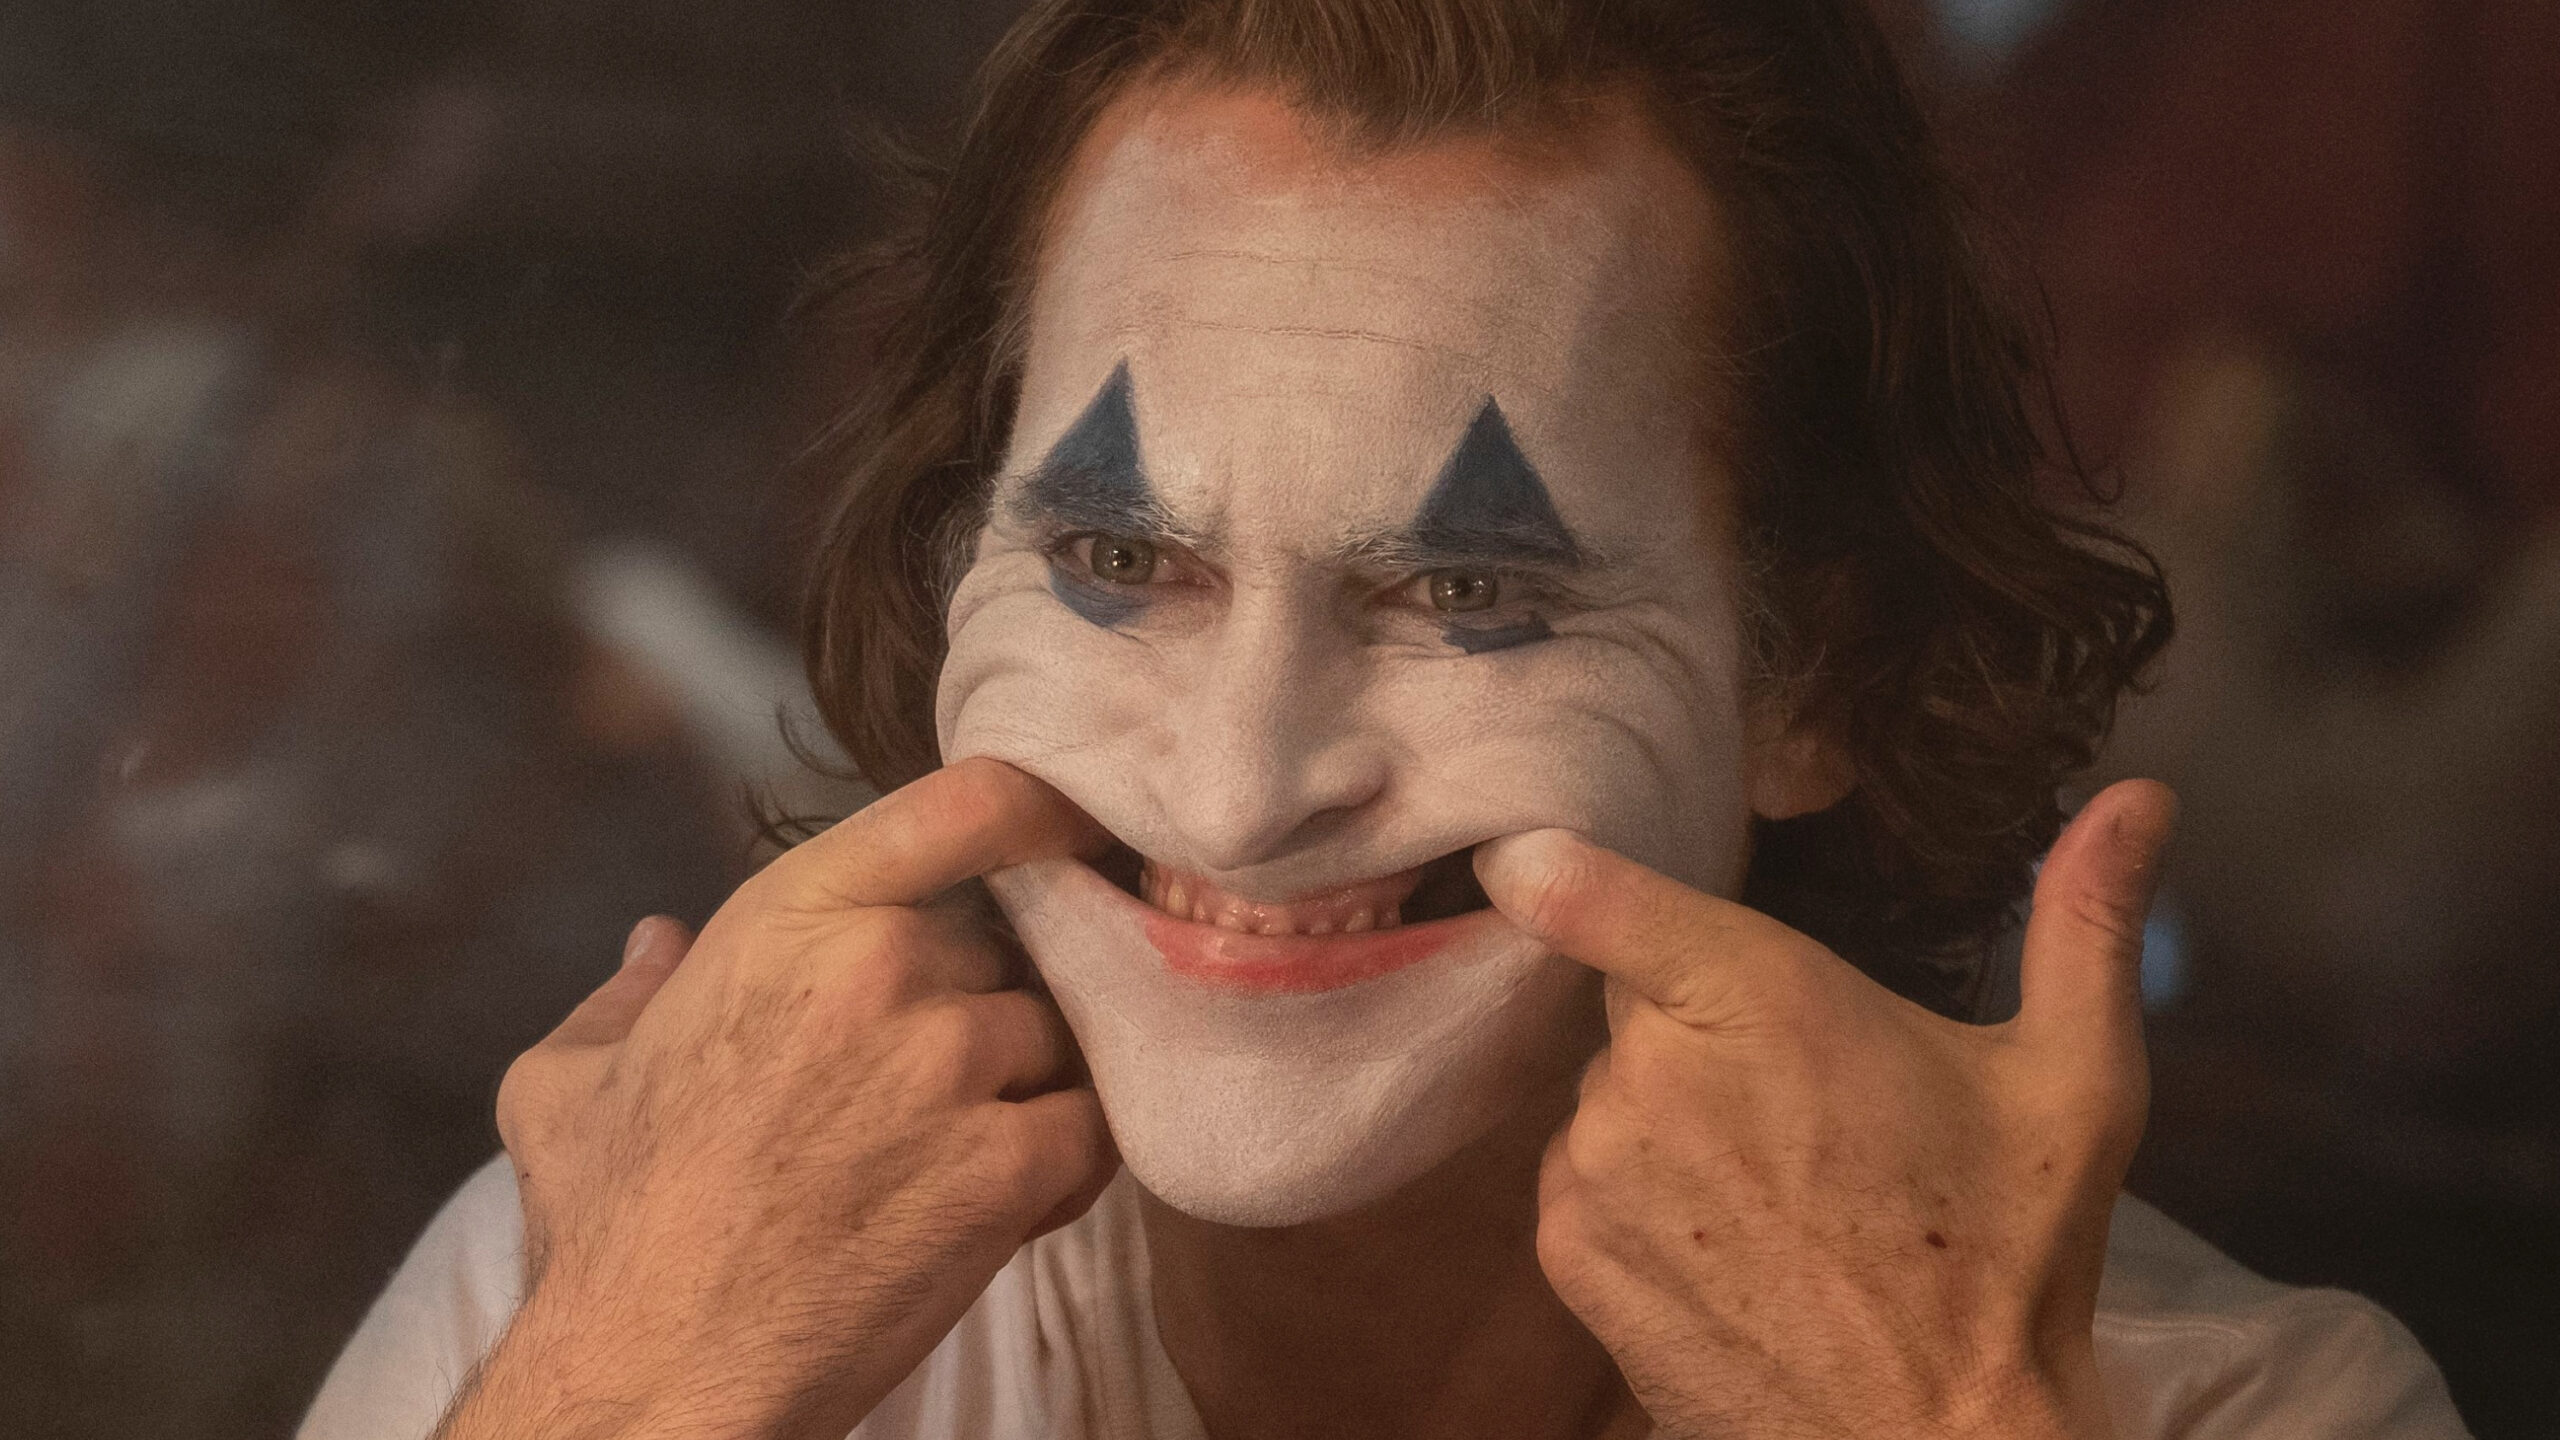 Joker 2: Joaquin Phoenix In Talks To Return